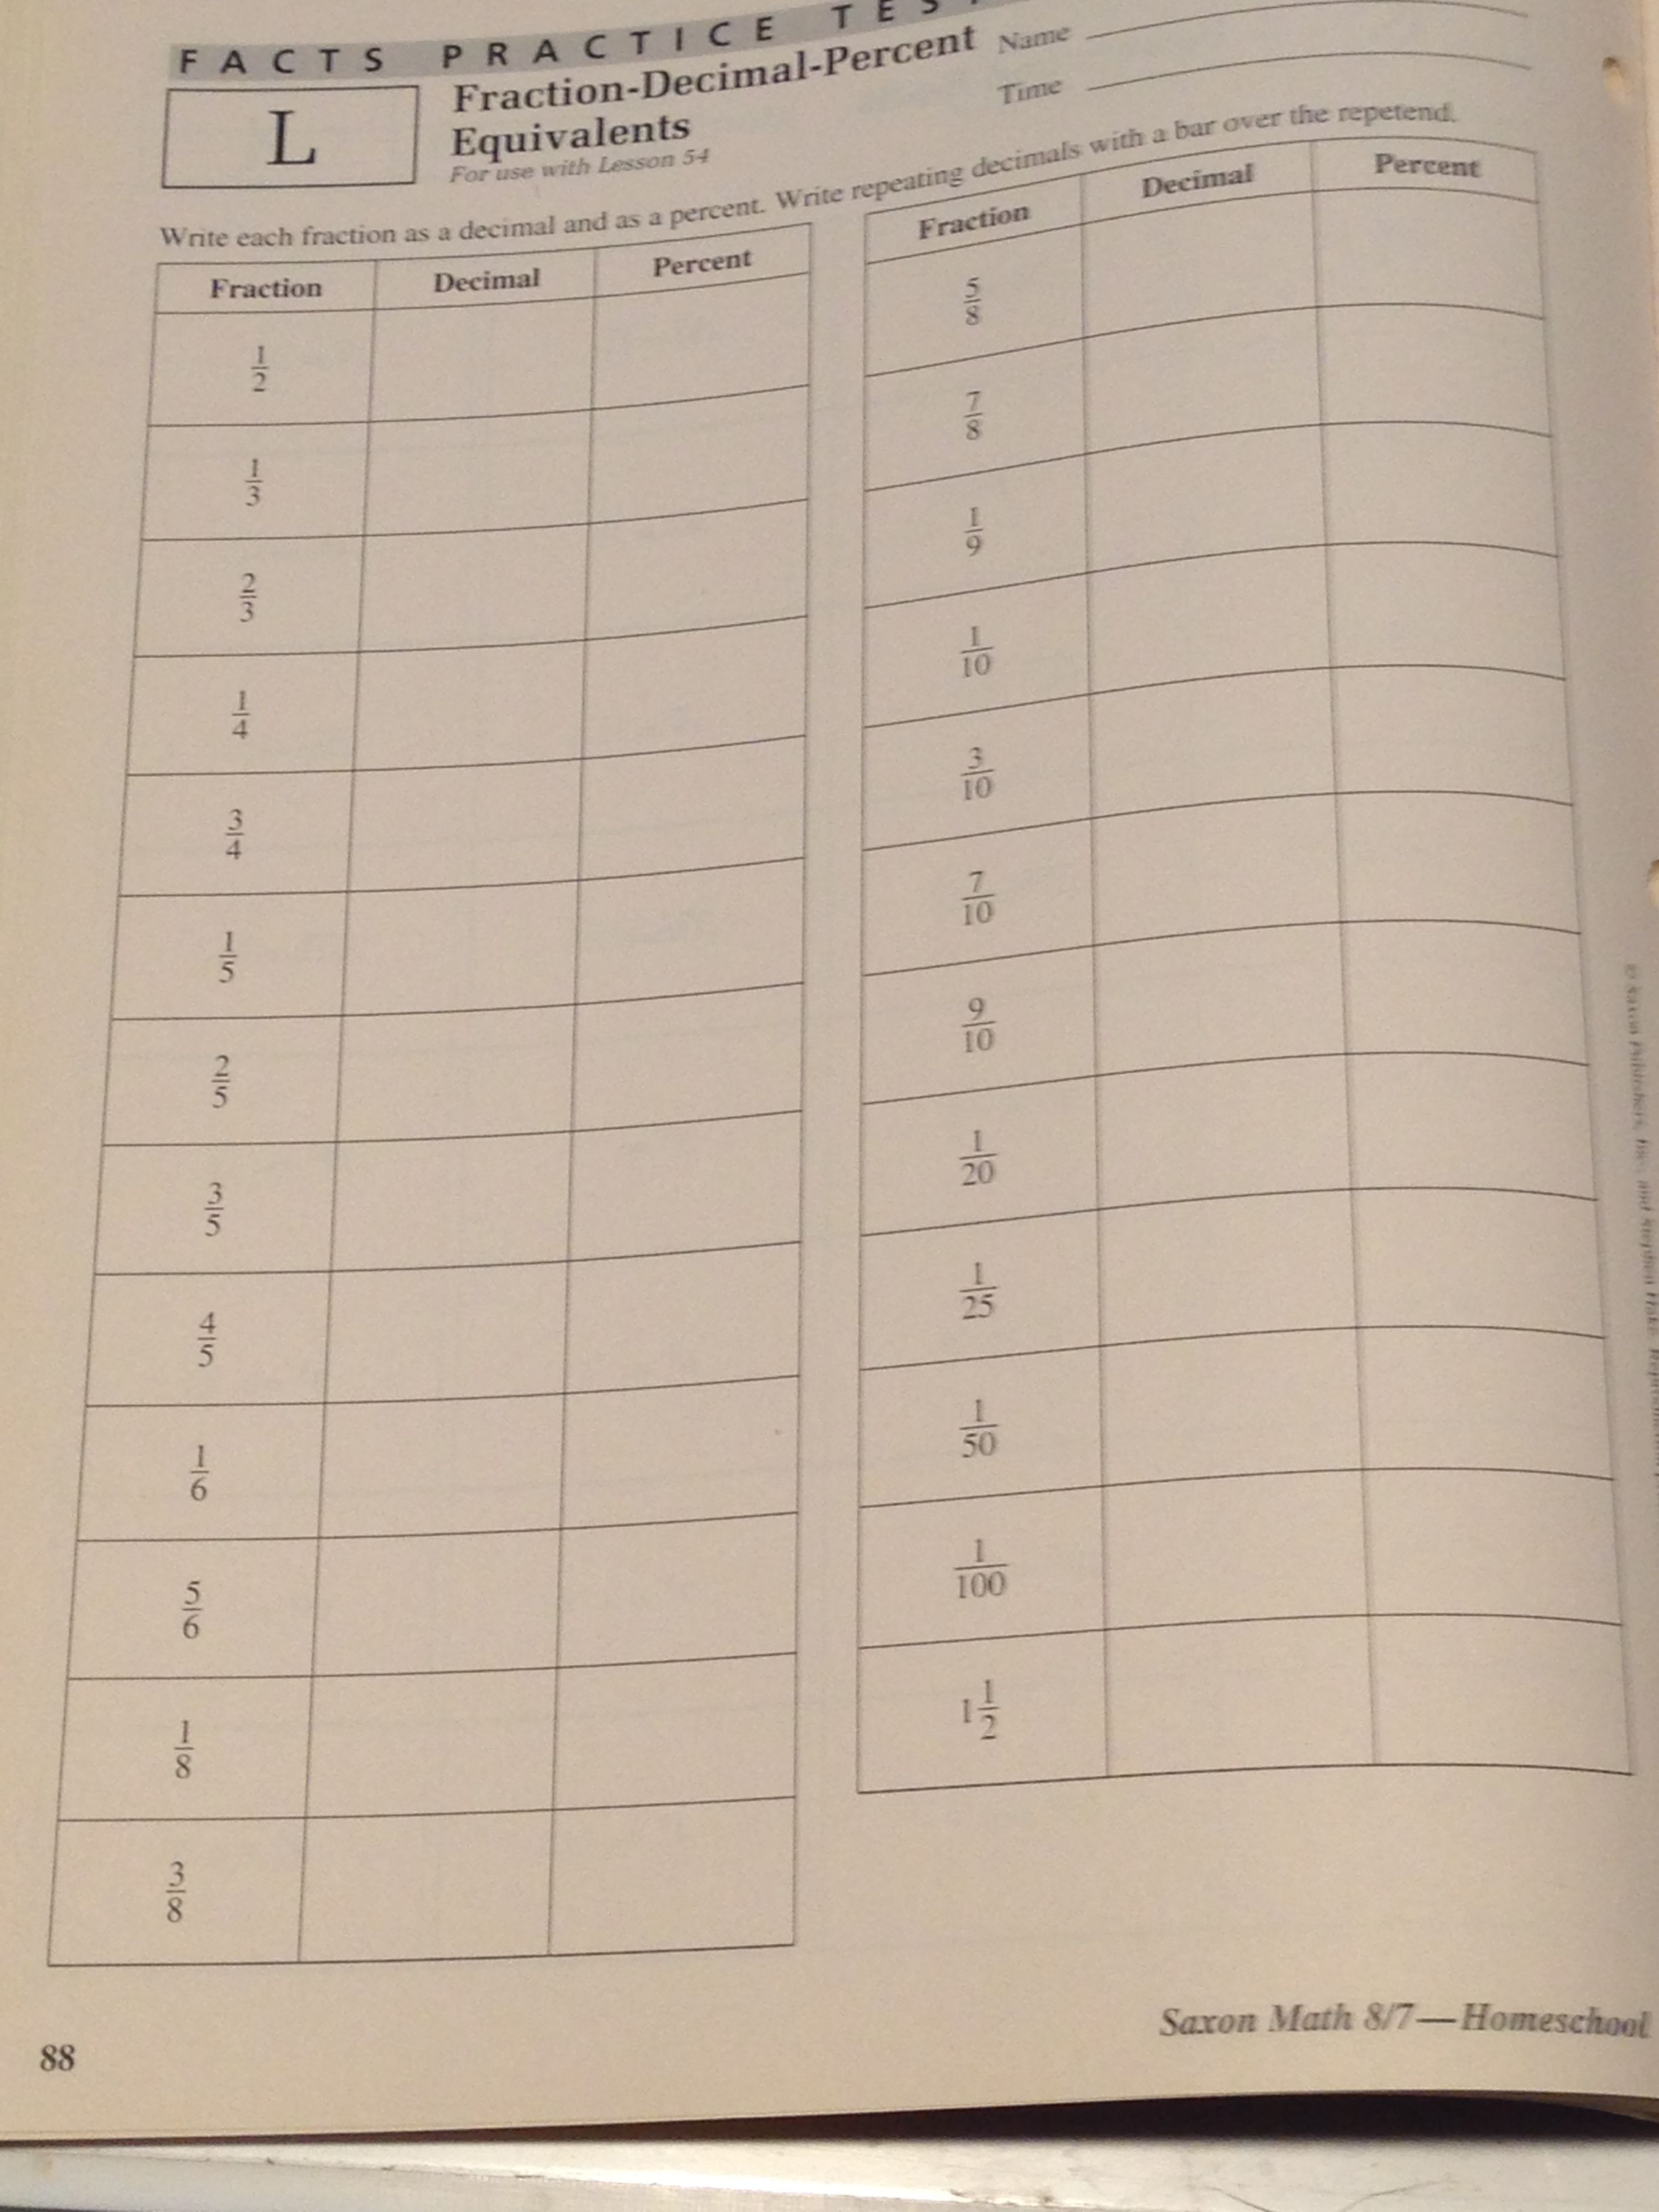 Should My Child Do Saxon Math 8 7 Or Algebra 1 2 Saxon Math Kids Math Worksheets Math Homework